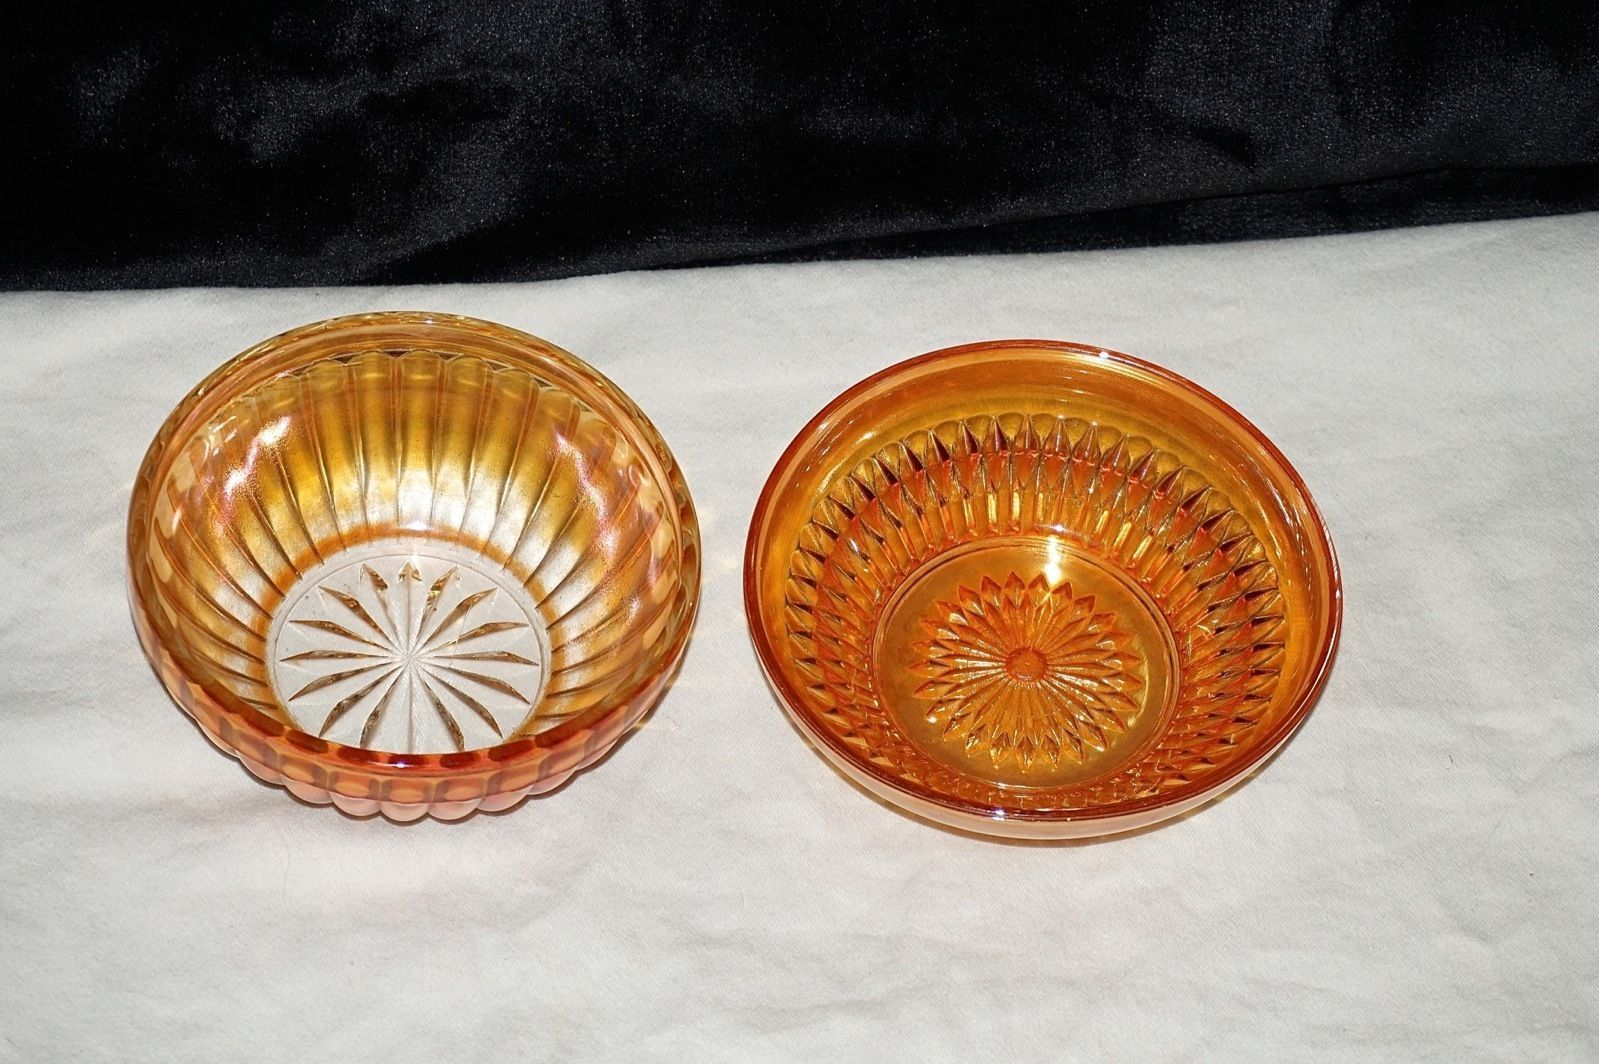 2 Vtg Marigold Orange Iridescent Carnival Glass Depression Era Bowls Imperial